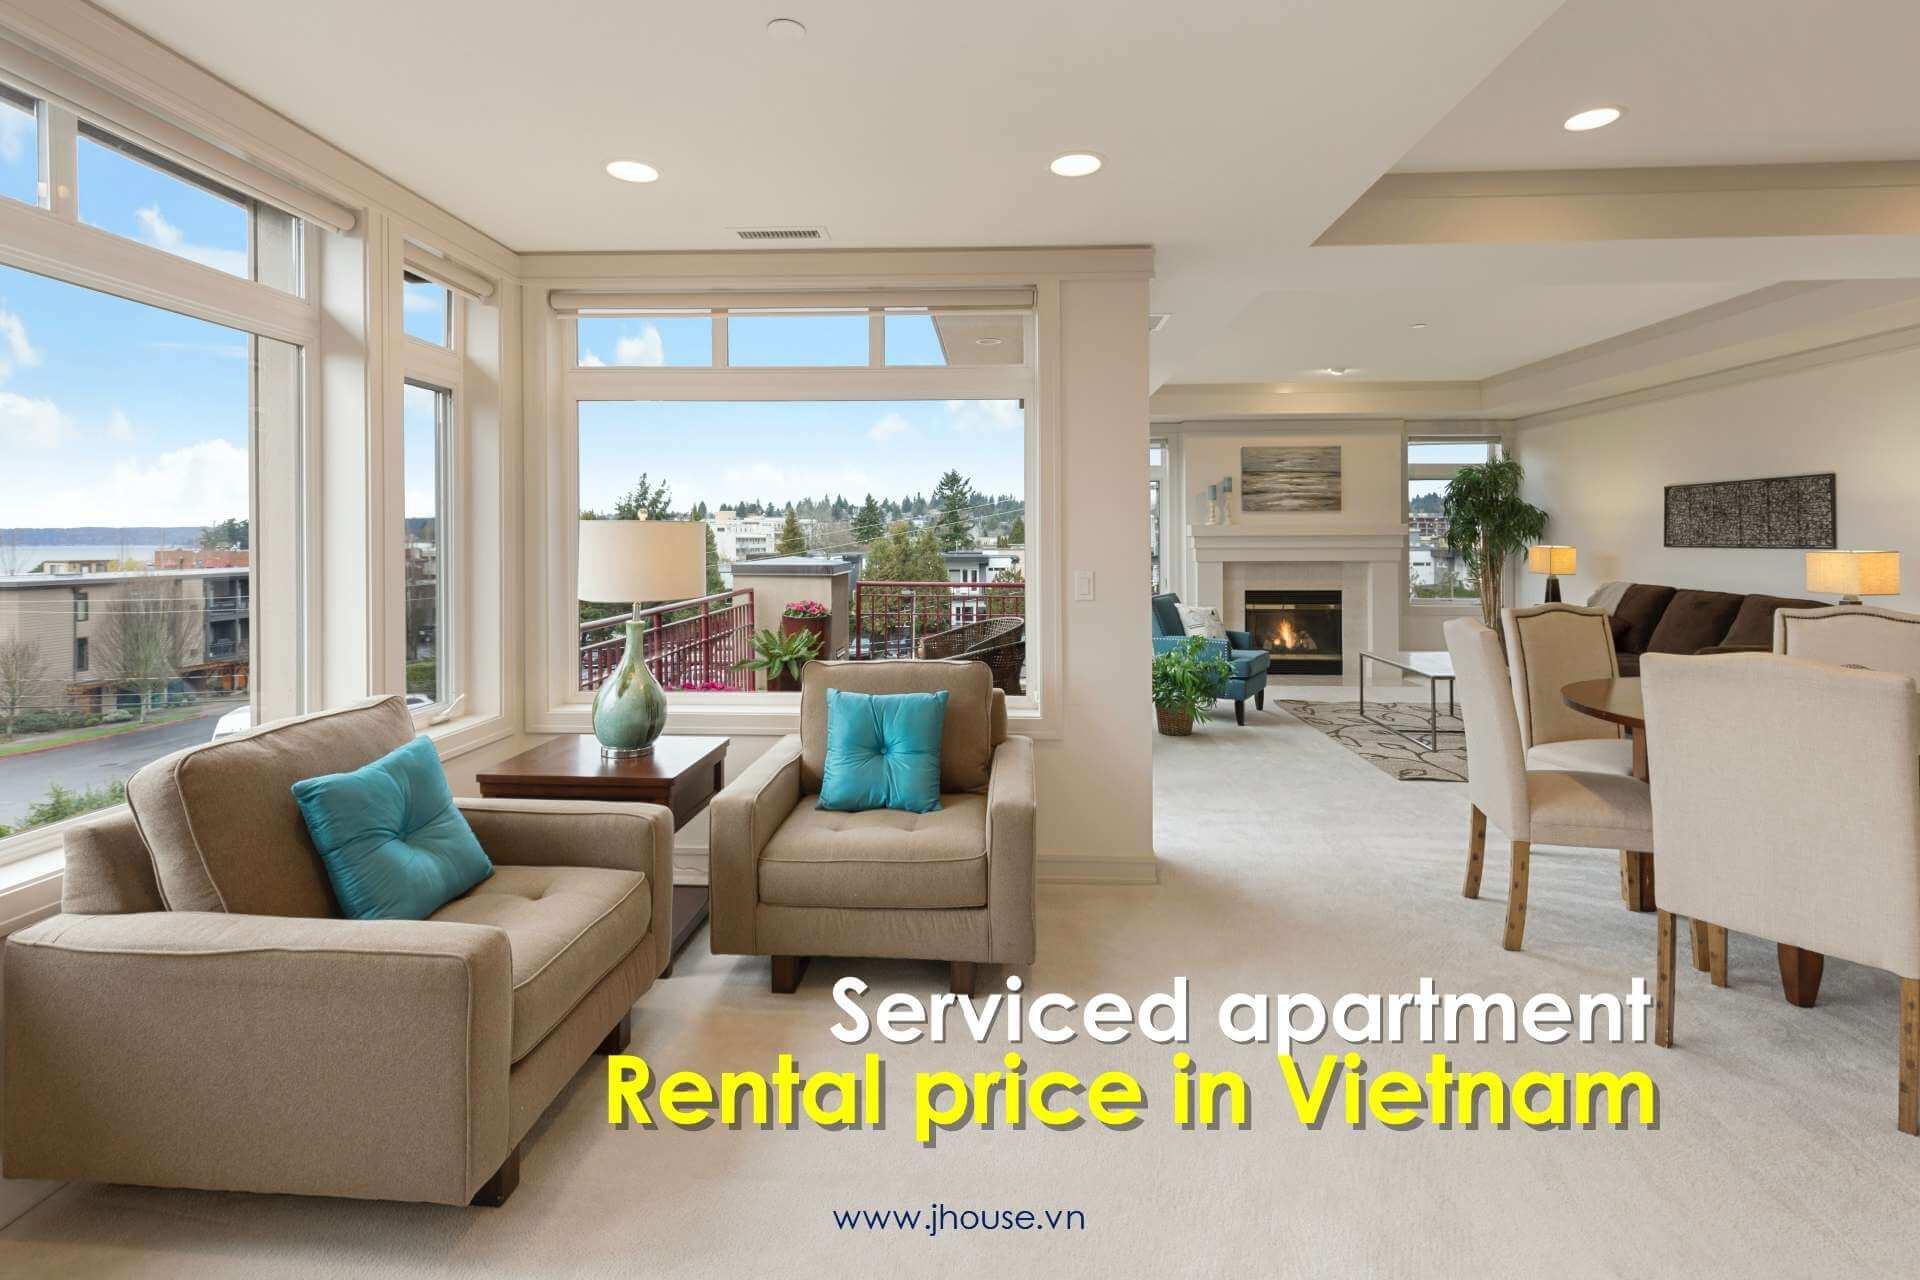 serviced apartment rental price in Vietnam